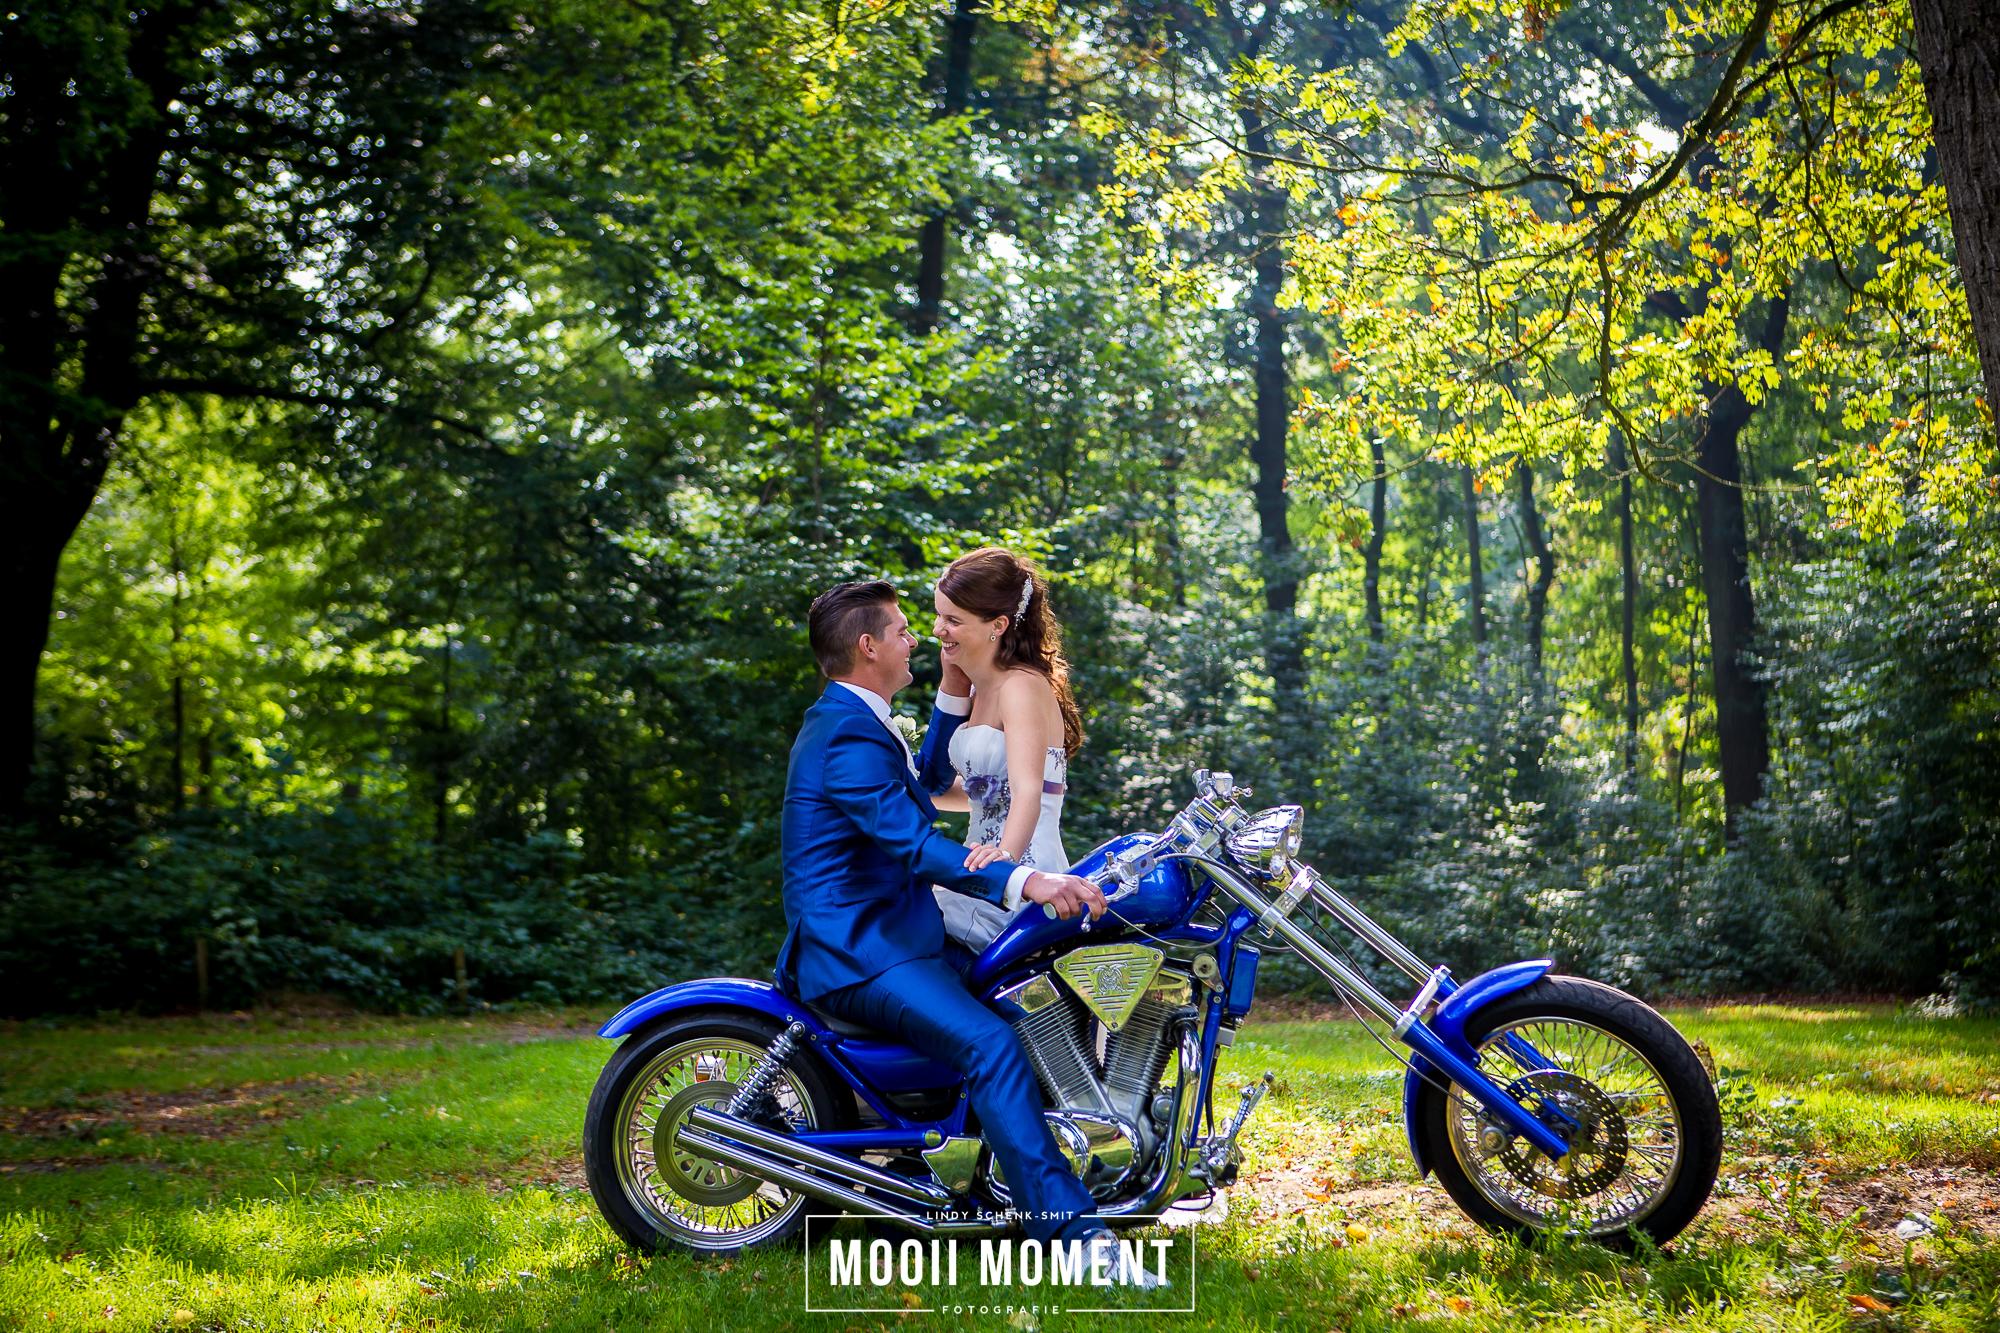 mooii-moment-bruioft-16-09-12